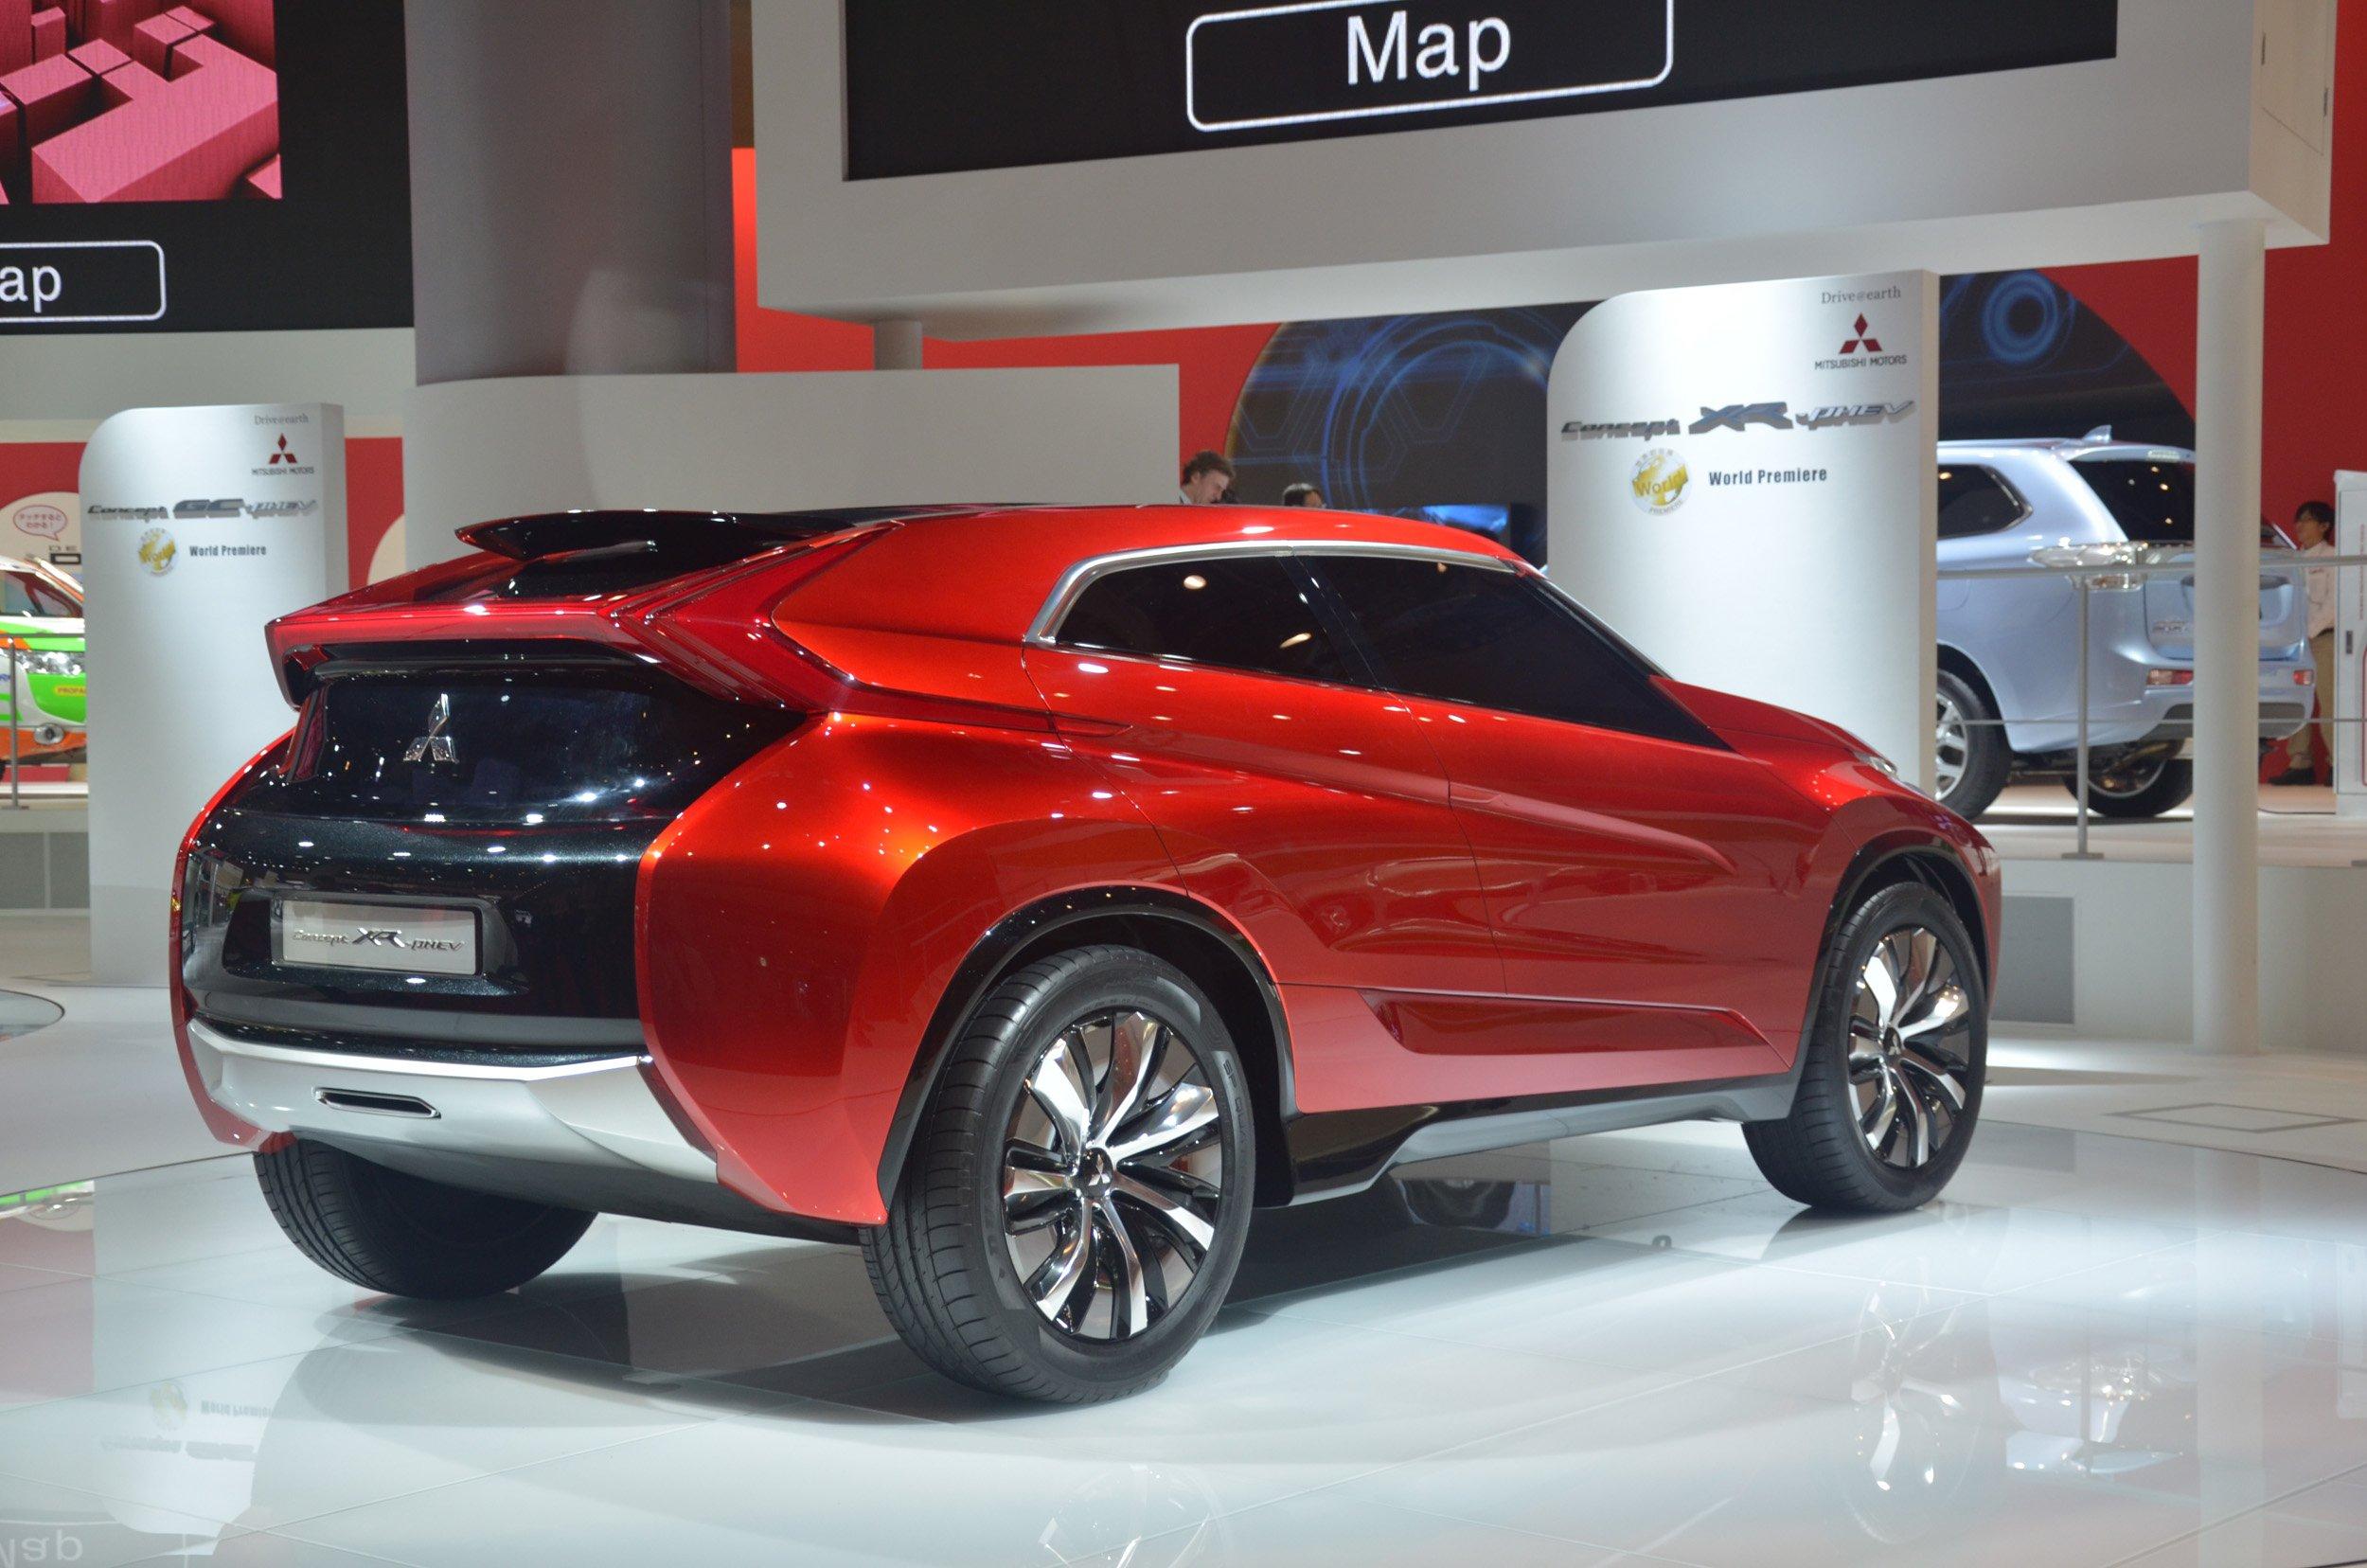 Tokyo 2013 – Mitsubishi Concept XR-PHEV Image 212812